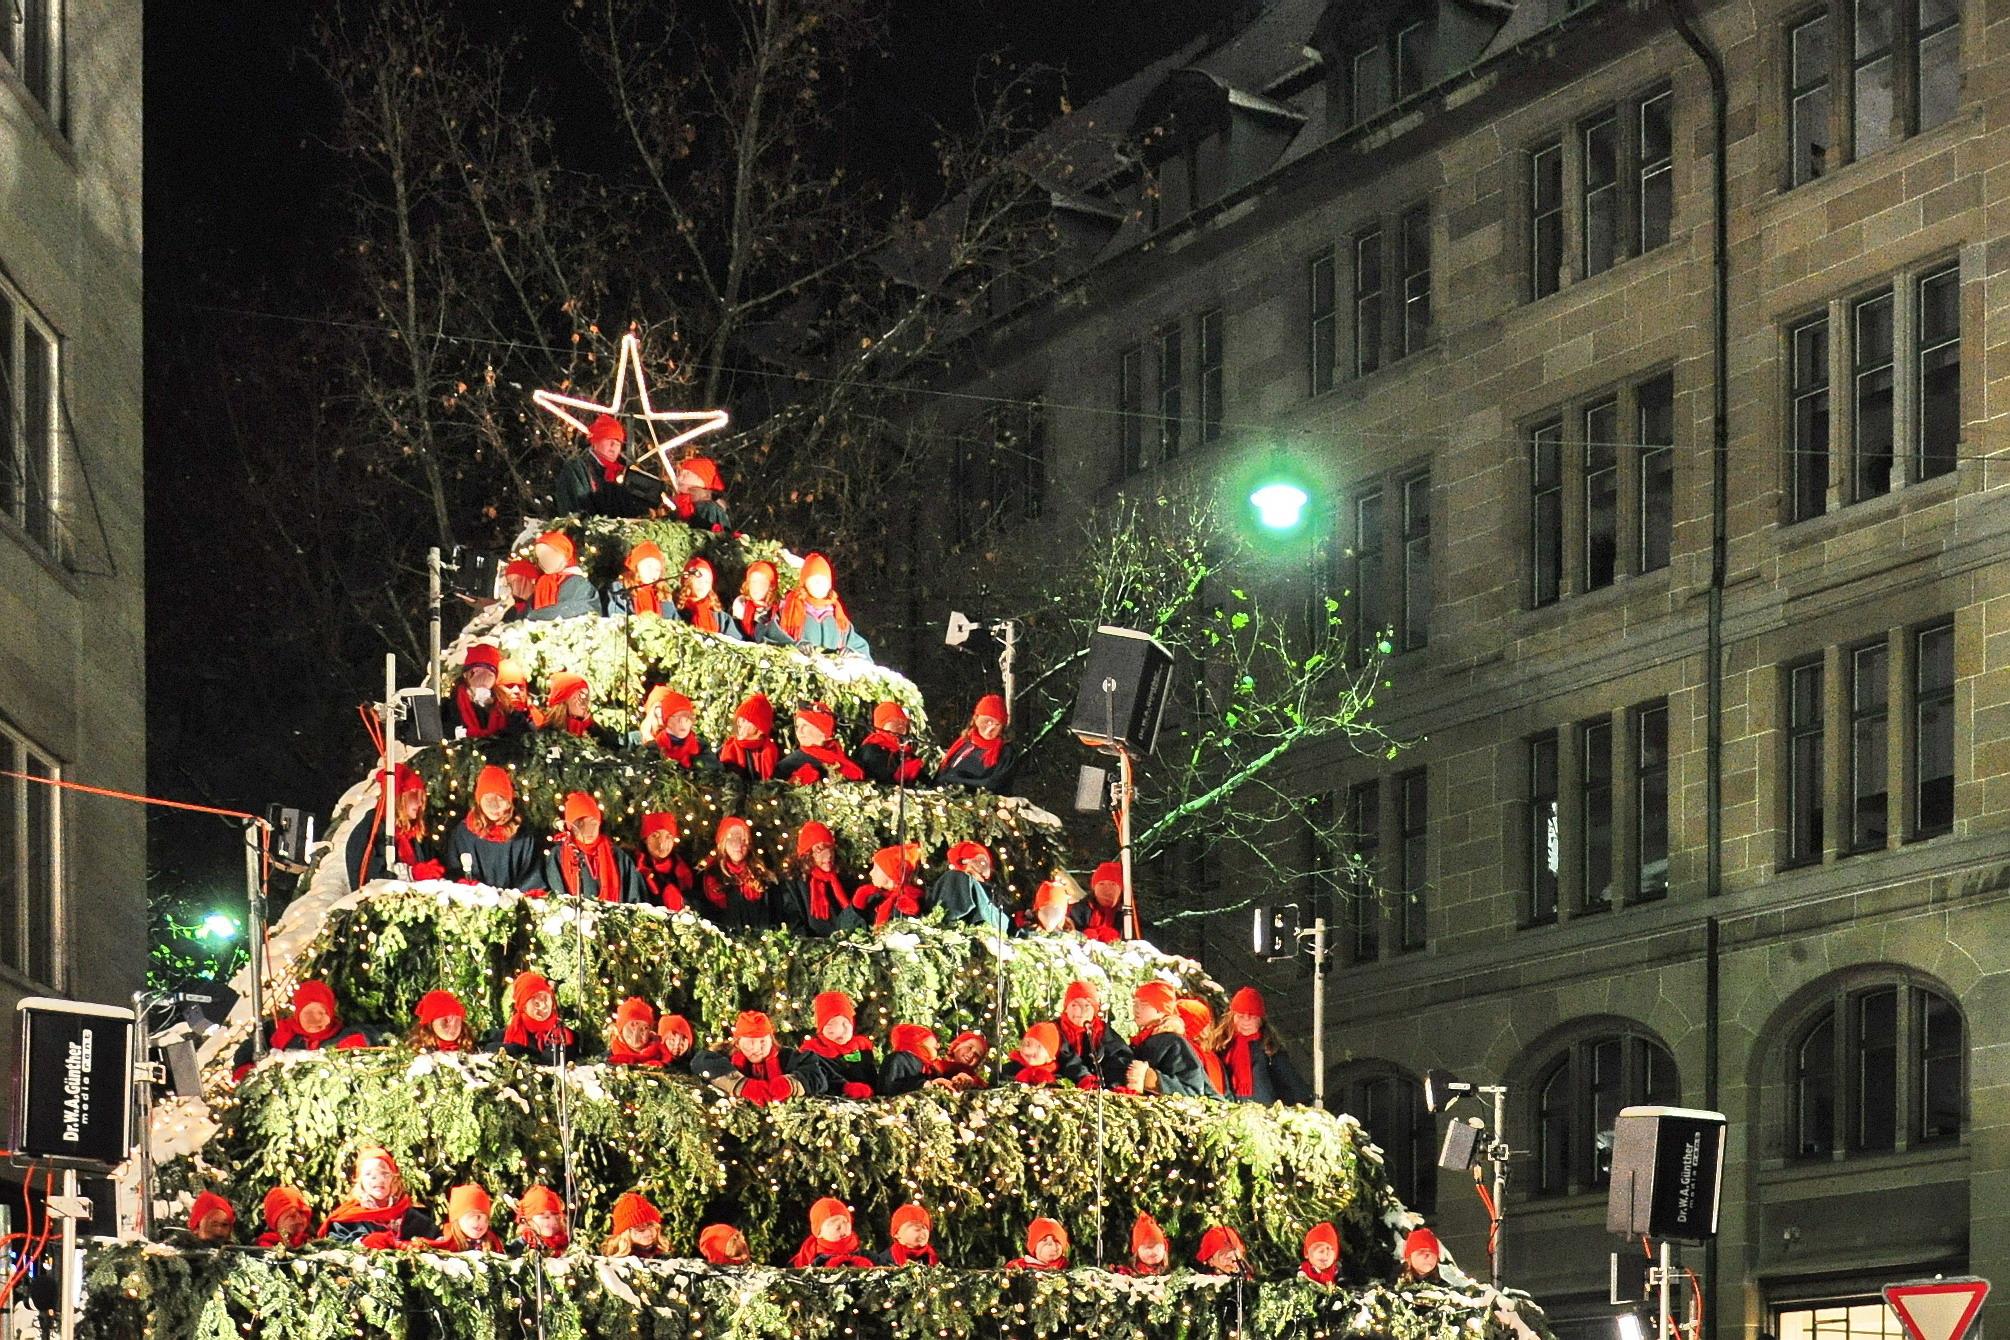 File Werdemühleplatz Singing Christmas Tree 2010 12 03 18 48 18